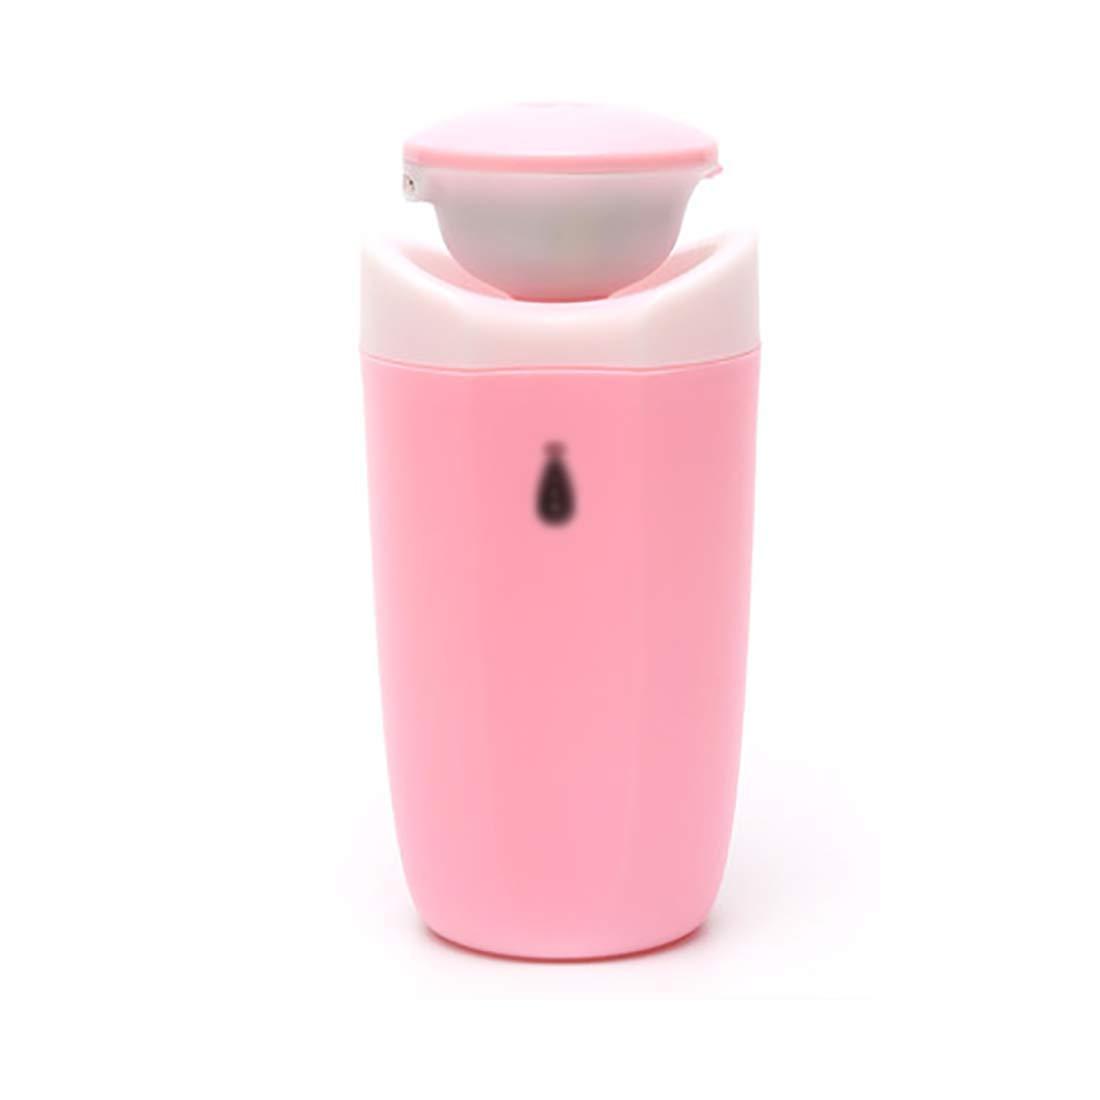 Zhi lian& 加湿器の家庭の寝室のリビングルームのオフィス超音波ミュート空気加湿器古典的な列の香りランプ噴霧器 (色 : Purple) B07MWTJNSM Pink Pink